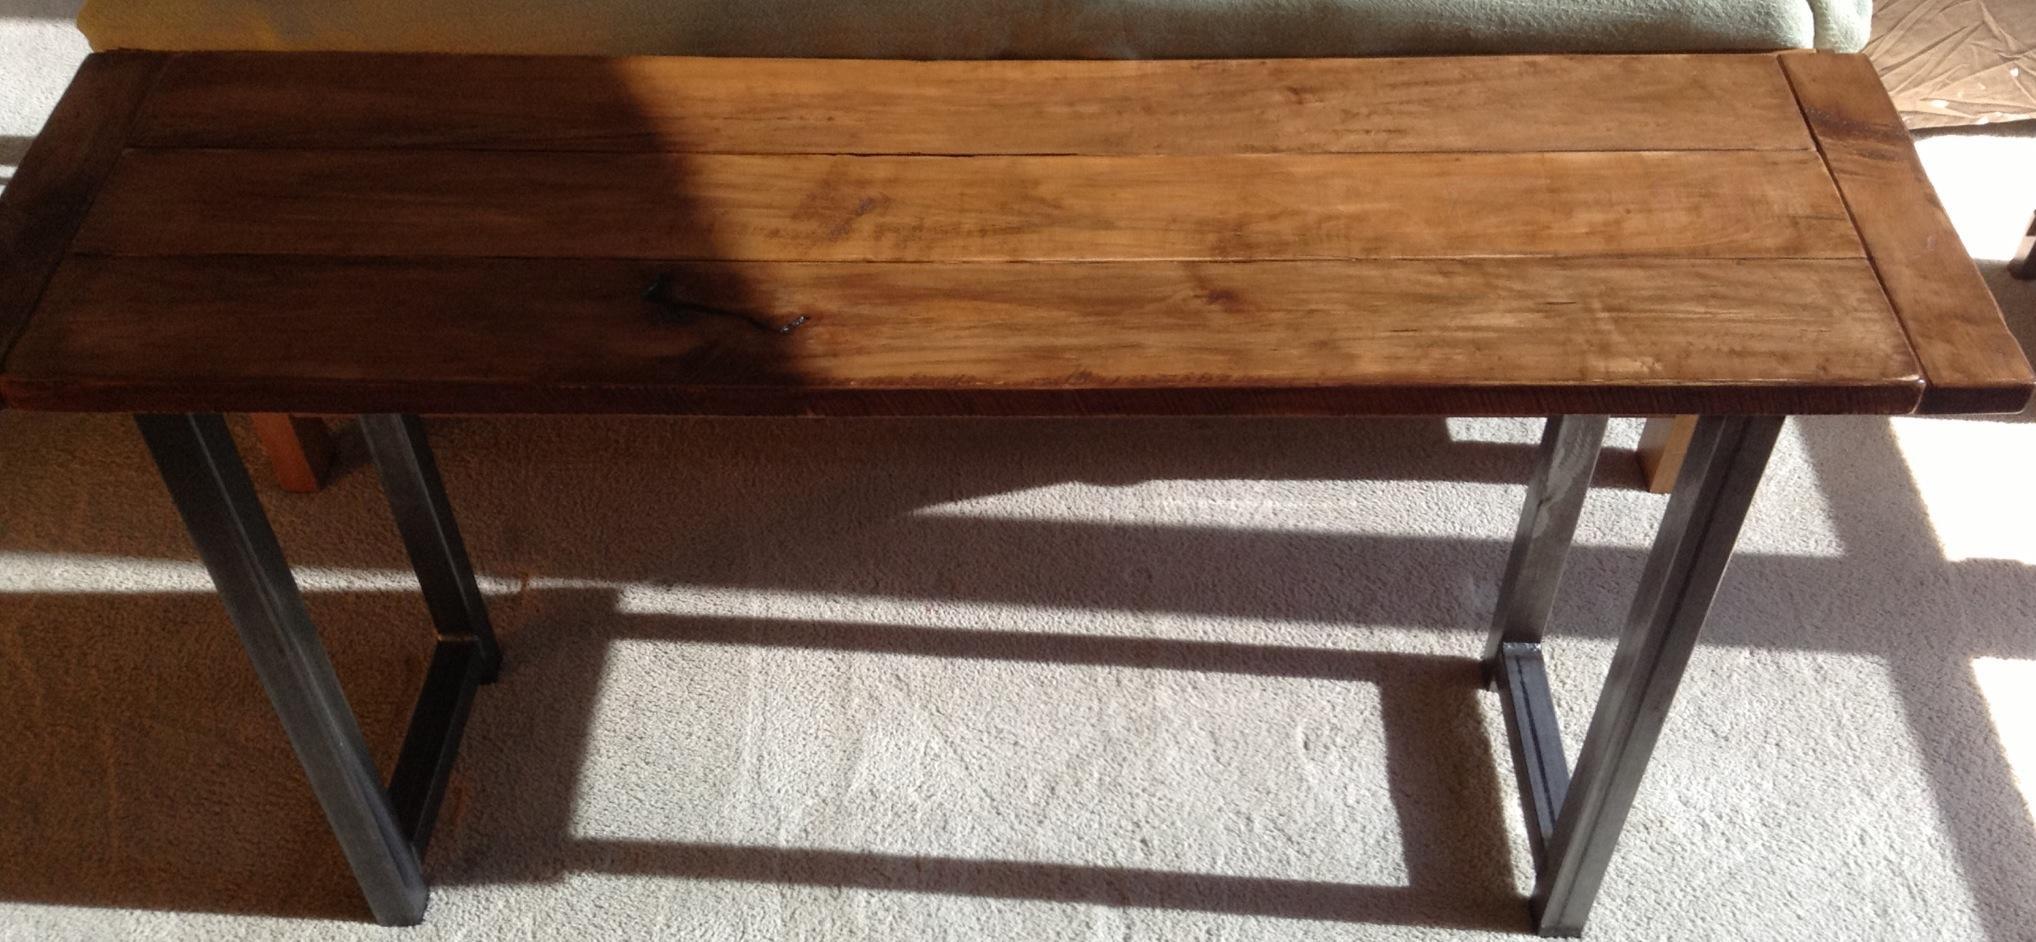 Slim Sofa Table Uk | Tehranmix Decoration Inside Slim Sofa Tables (Image 16 of 20)